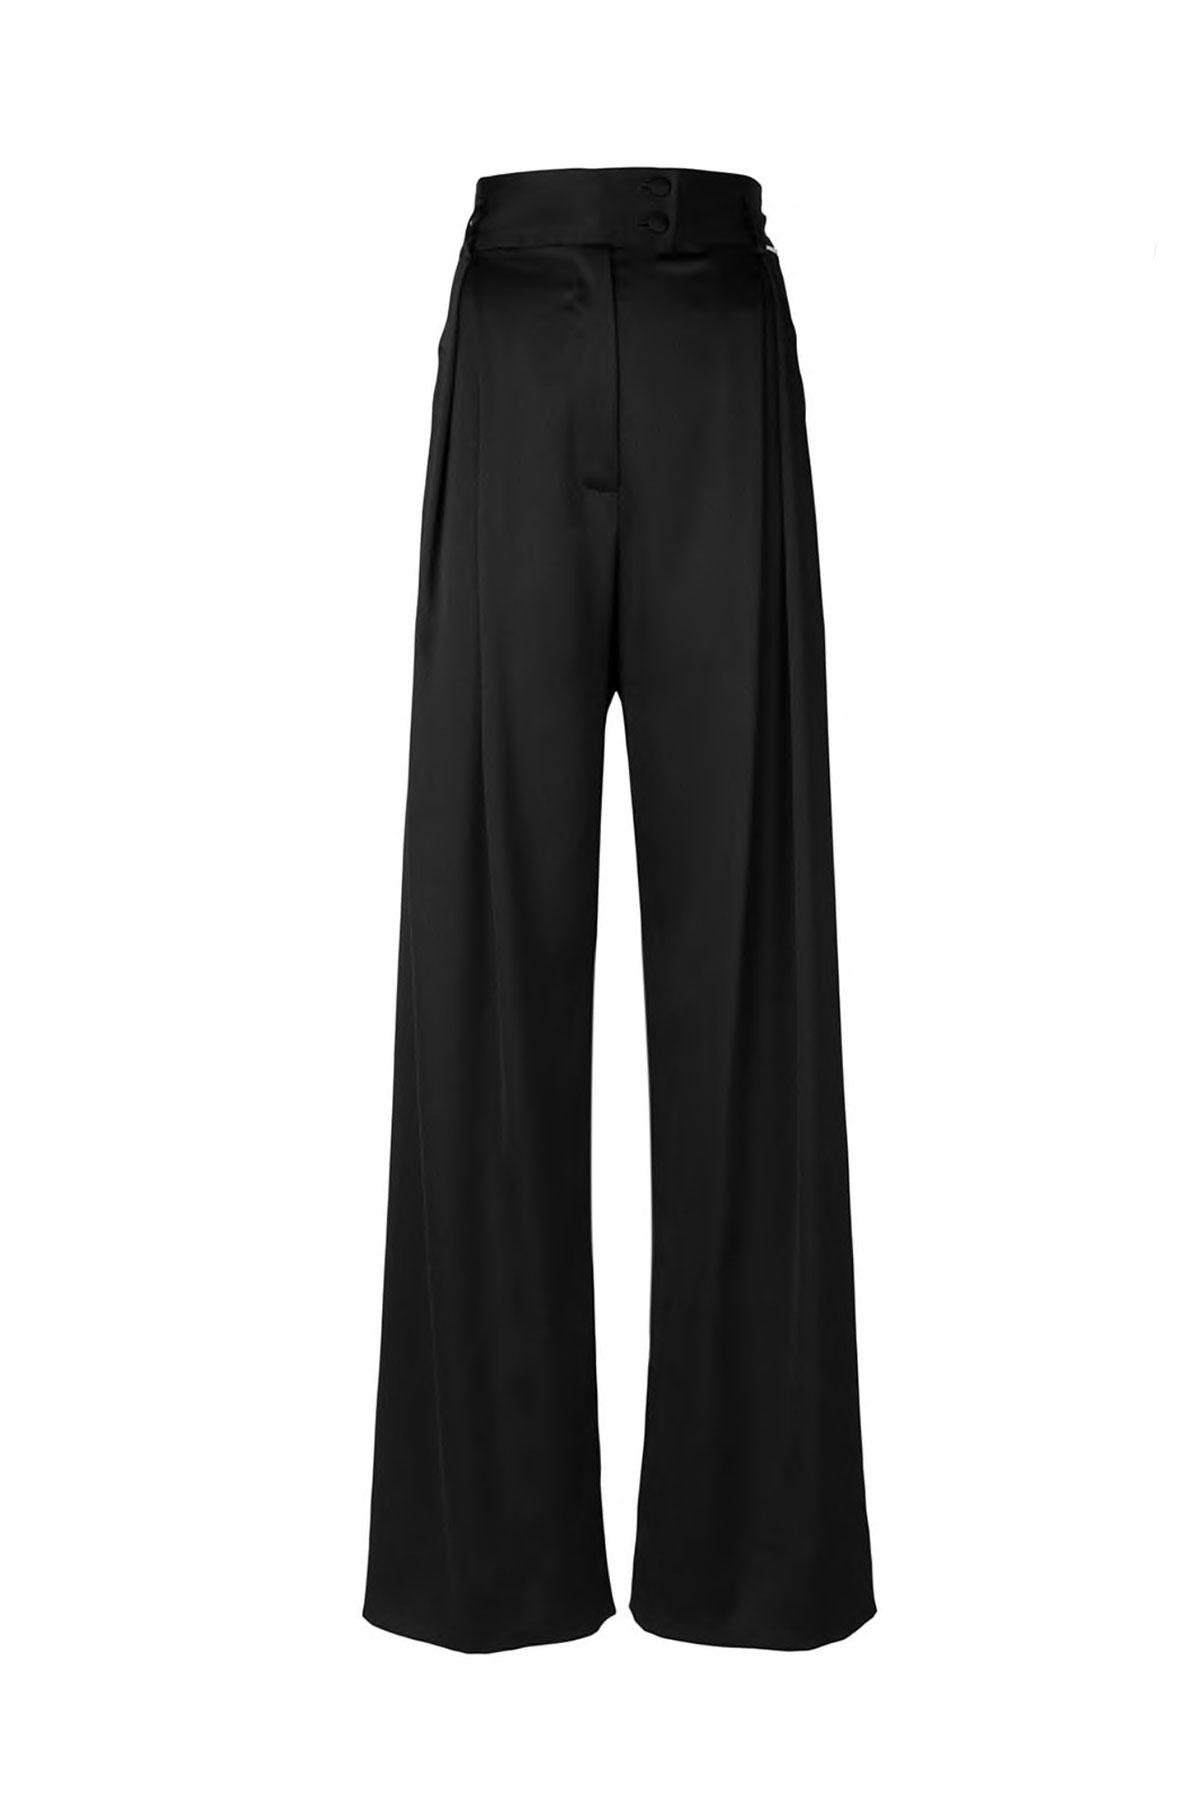 BLACK SUPER WIDE-LEG PANTS